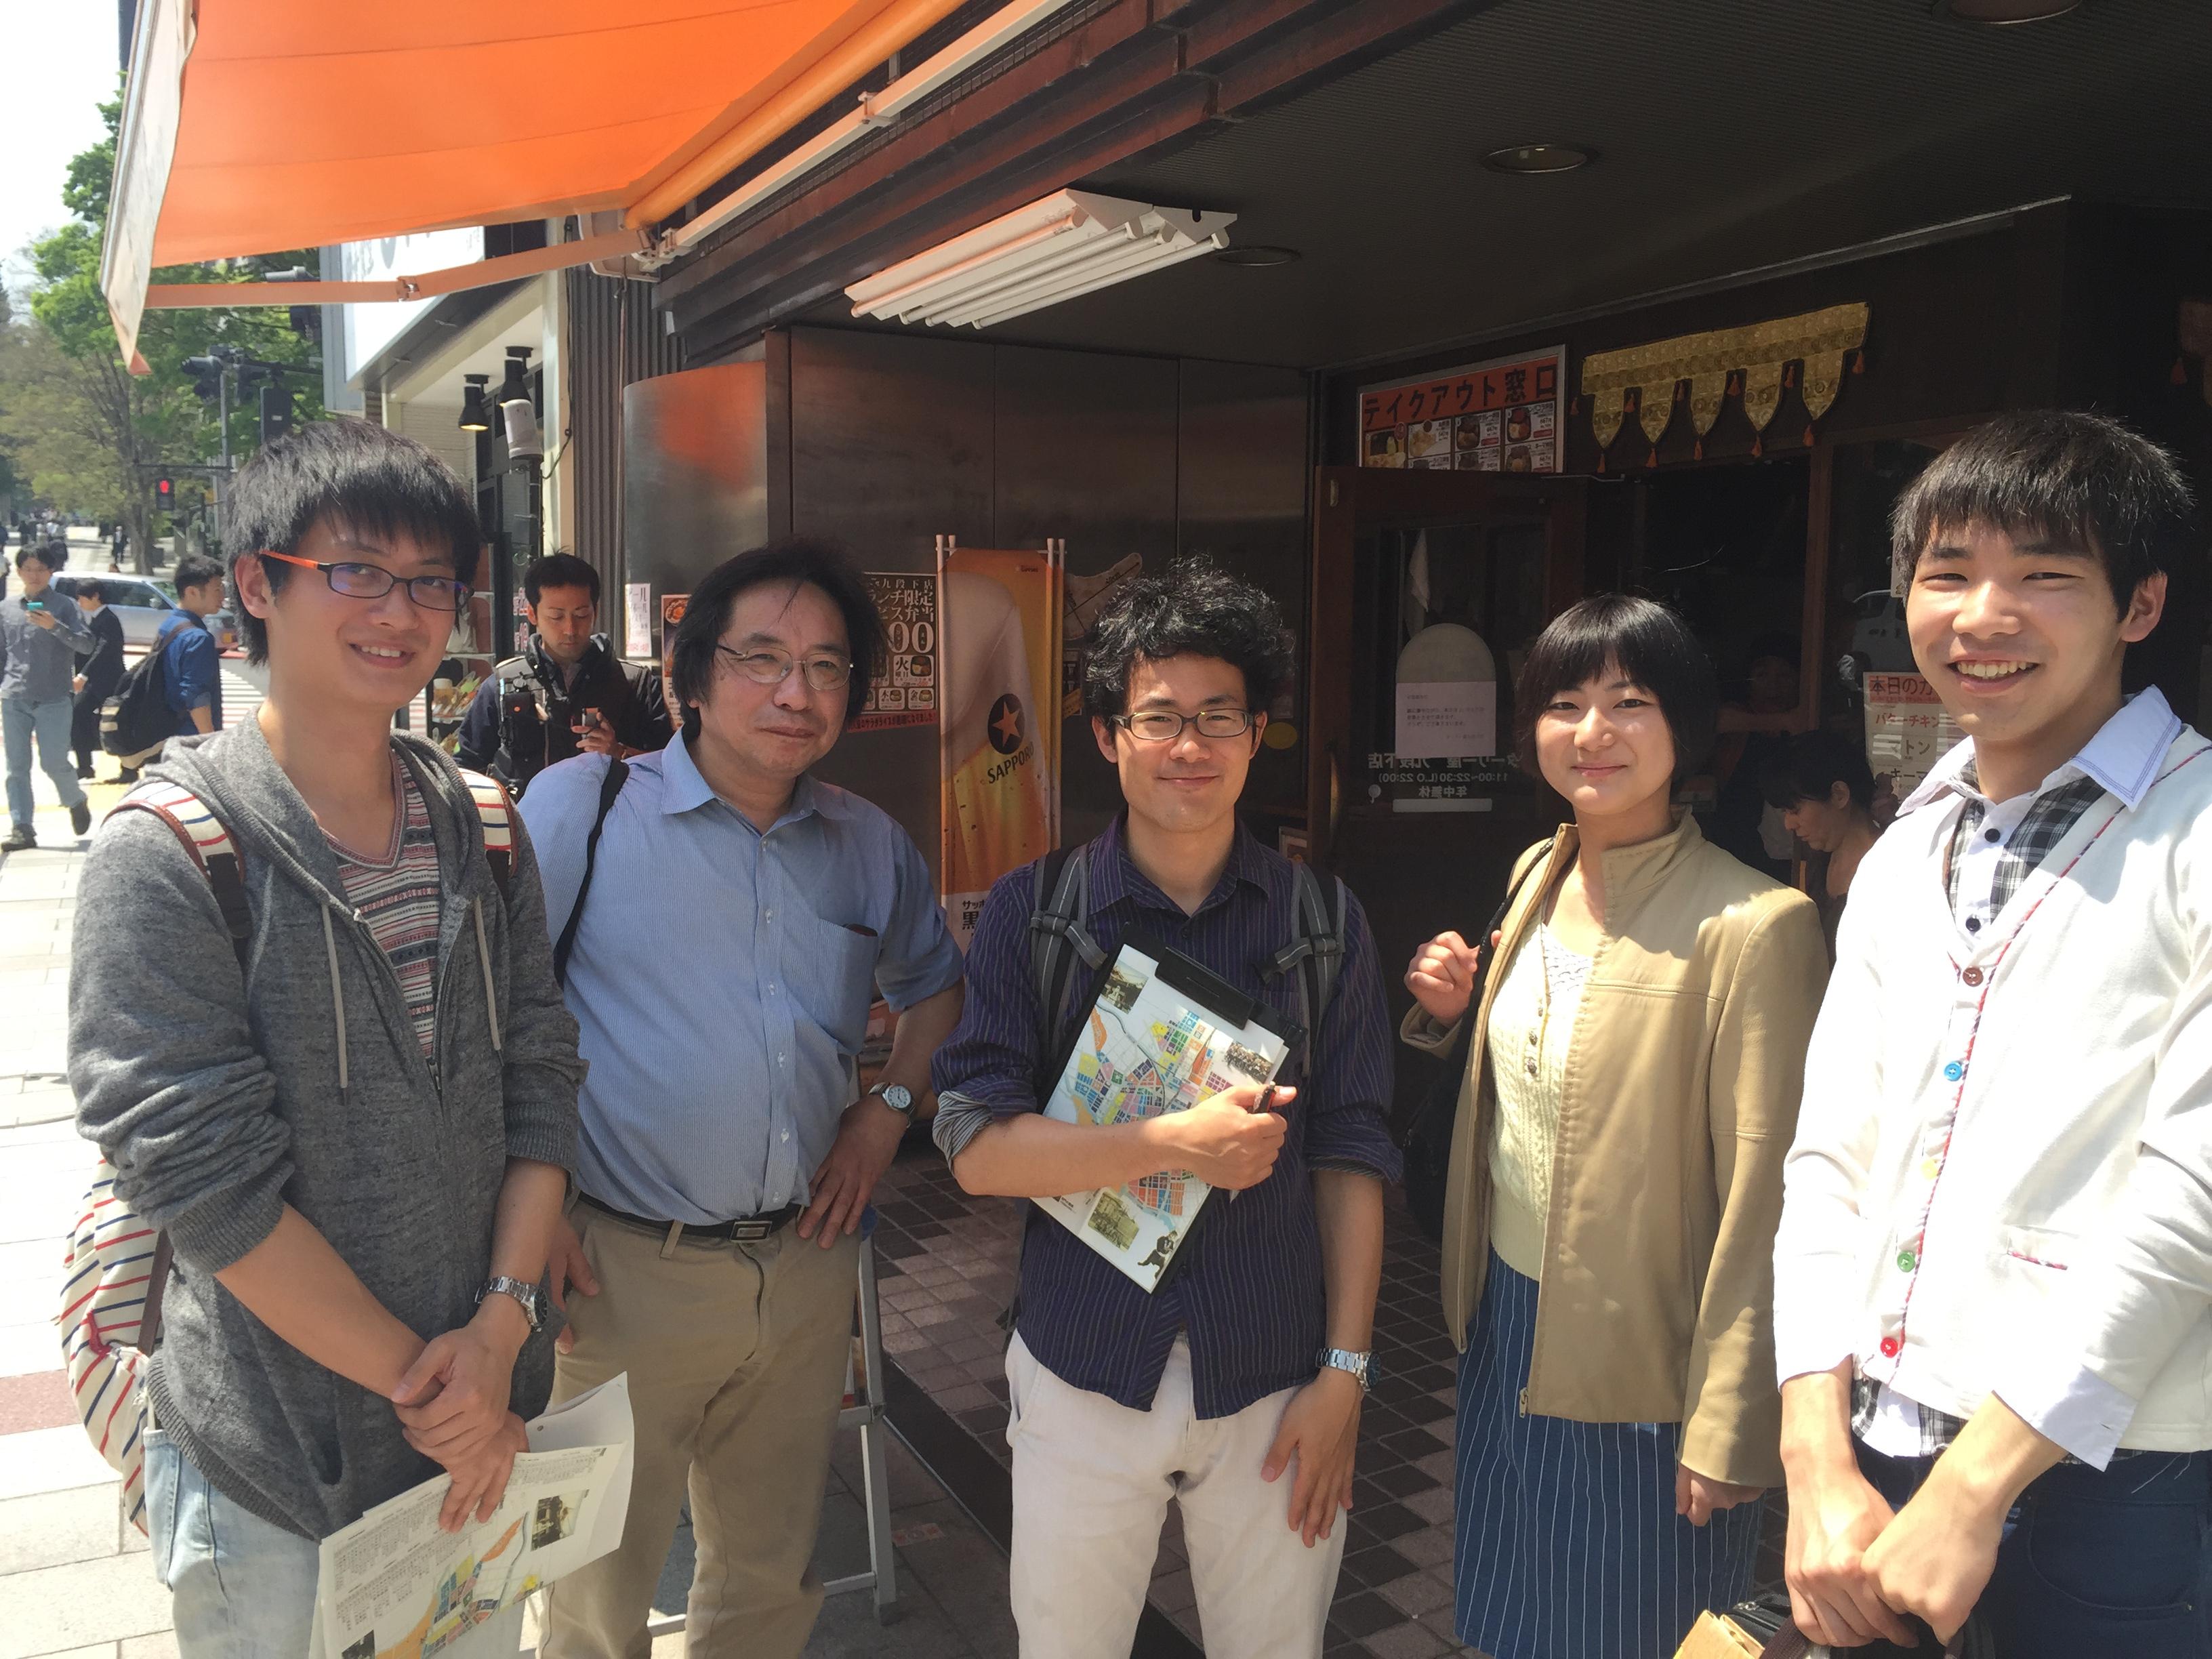 http://ud.t.u-tokyo.ac.jp/news/_images/IMG_0189.JPG